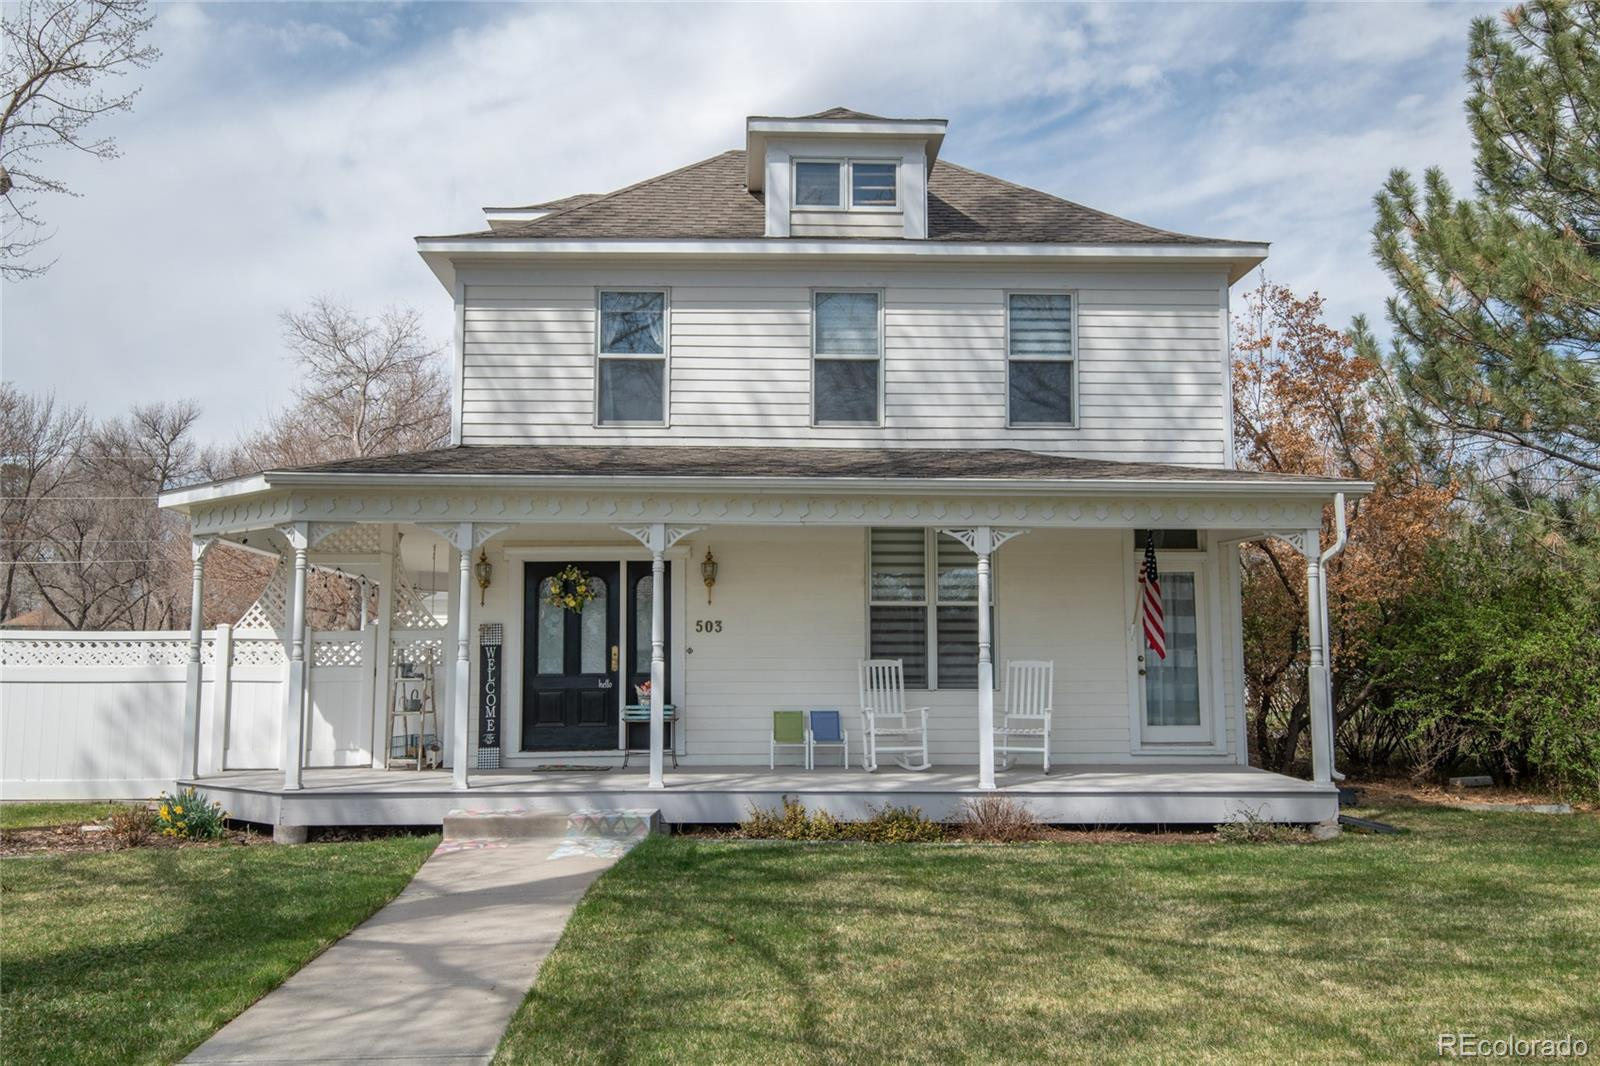 503 Grant Street, Fort Morgan, CO 80701 - Fort Morgan, CO real estate listing